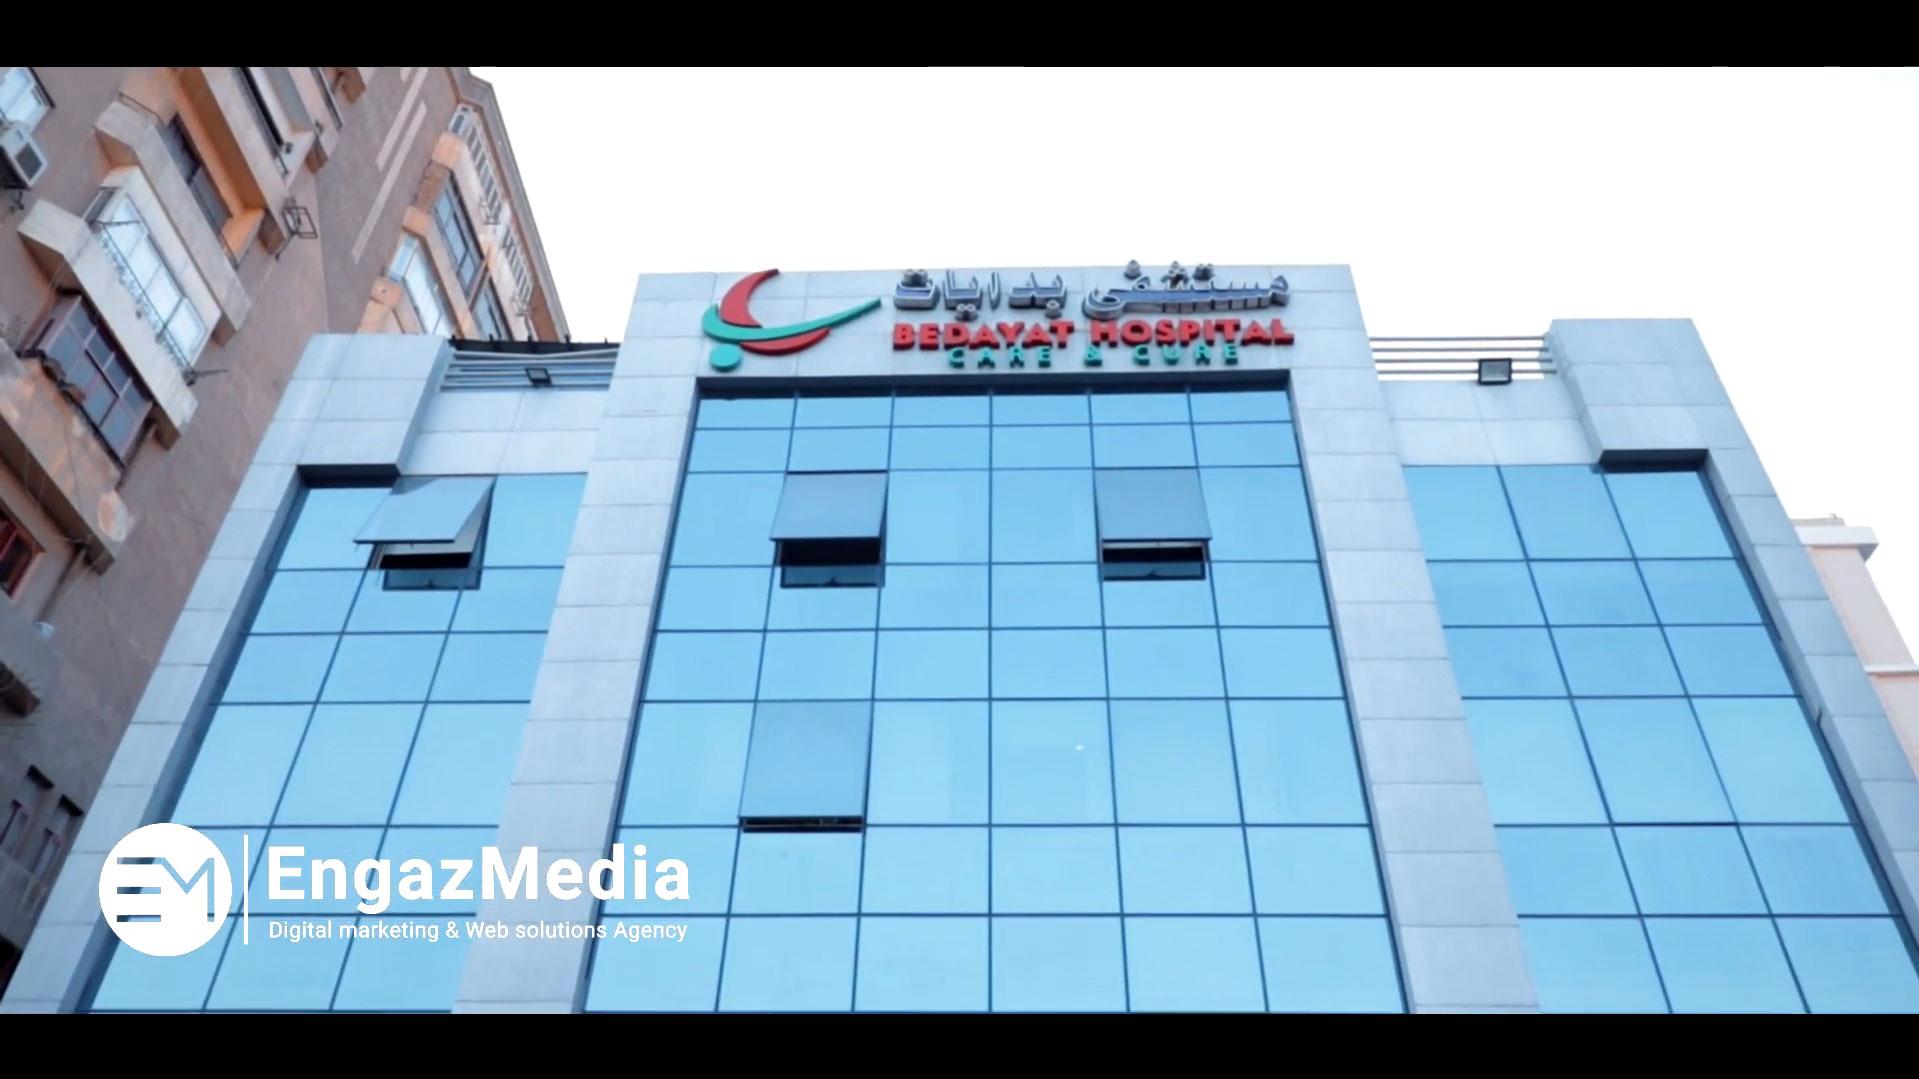 Bedayat Hospital - إنتاج الفيديوهات -